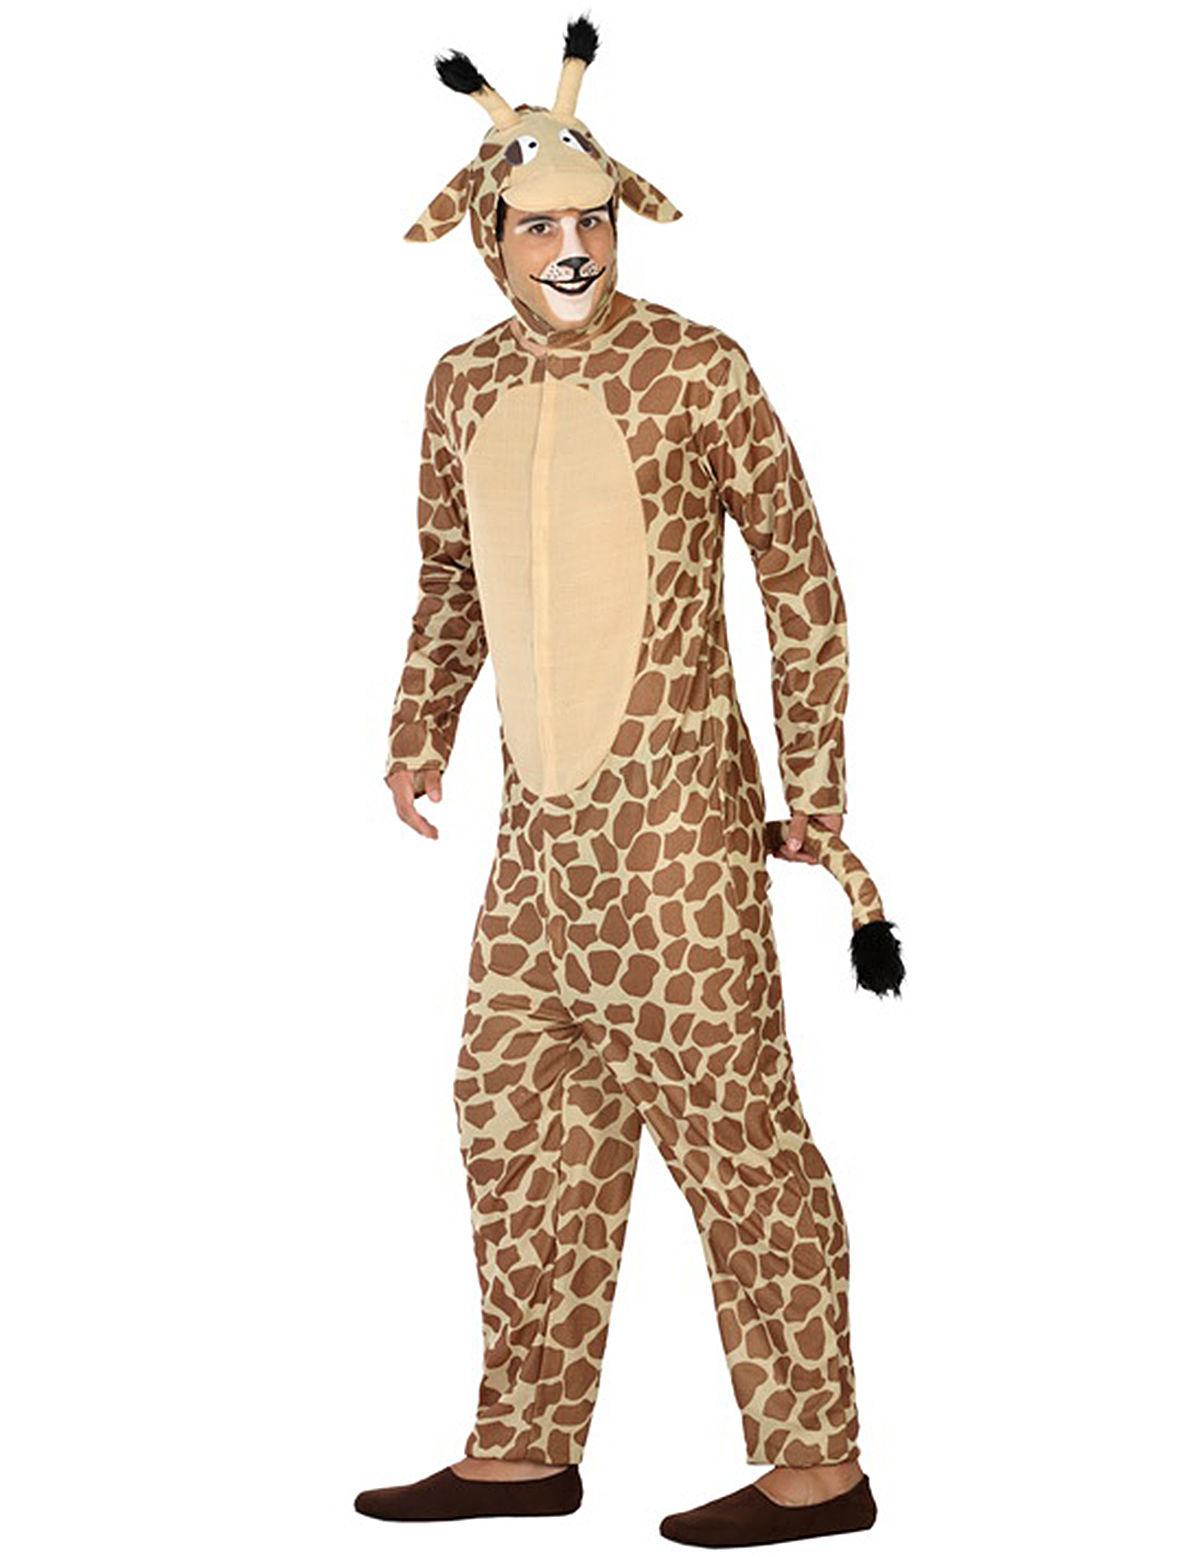 Giraffe Kostüm Kinder : giraffe kost m jumpsuit tierkost m braun beige g nstige faschings kost me bei karneval megastore ~ Frokenaadalensverden.com Haus und Dekorationen